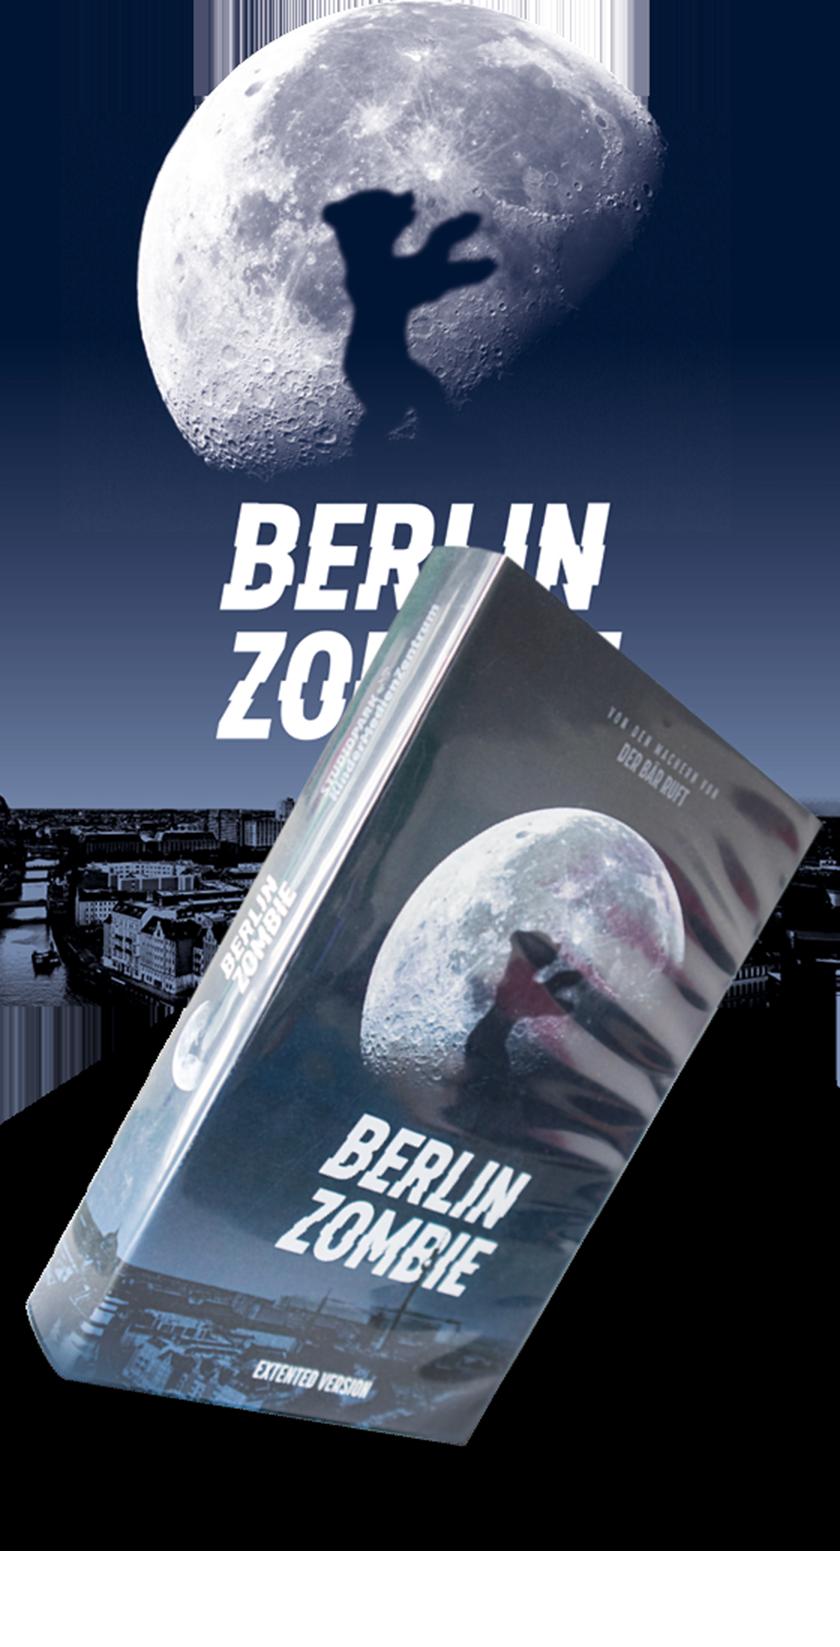 Samt&Seidel_Referenz_Studiopark_Kindermedienzentrum_Berlinale_Design_07